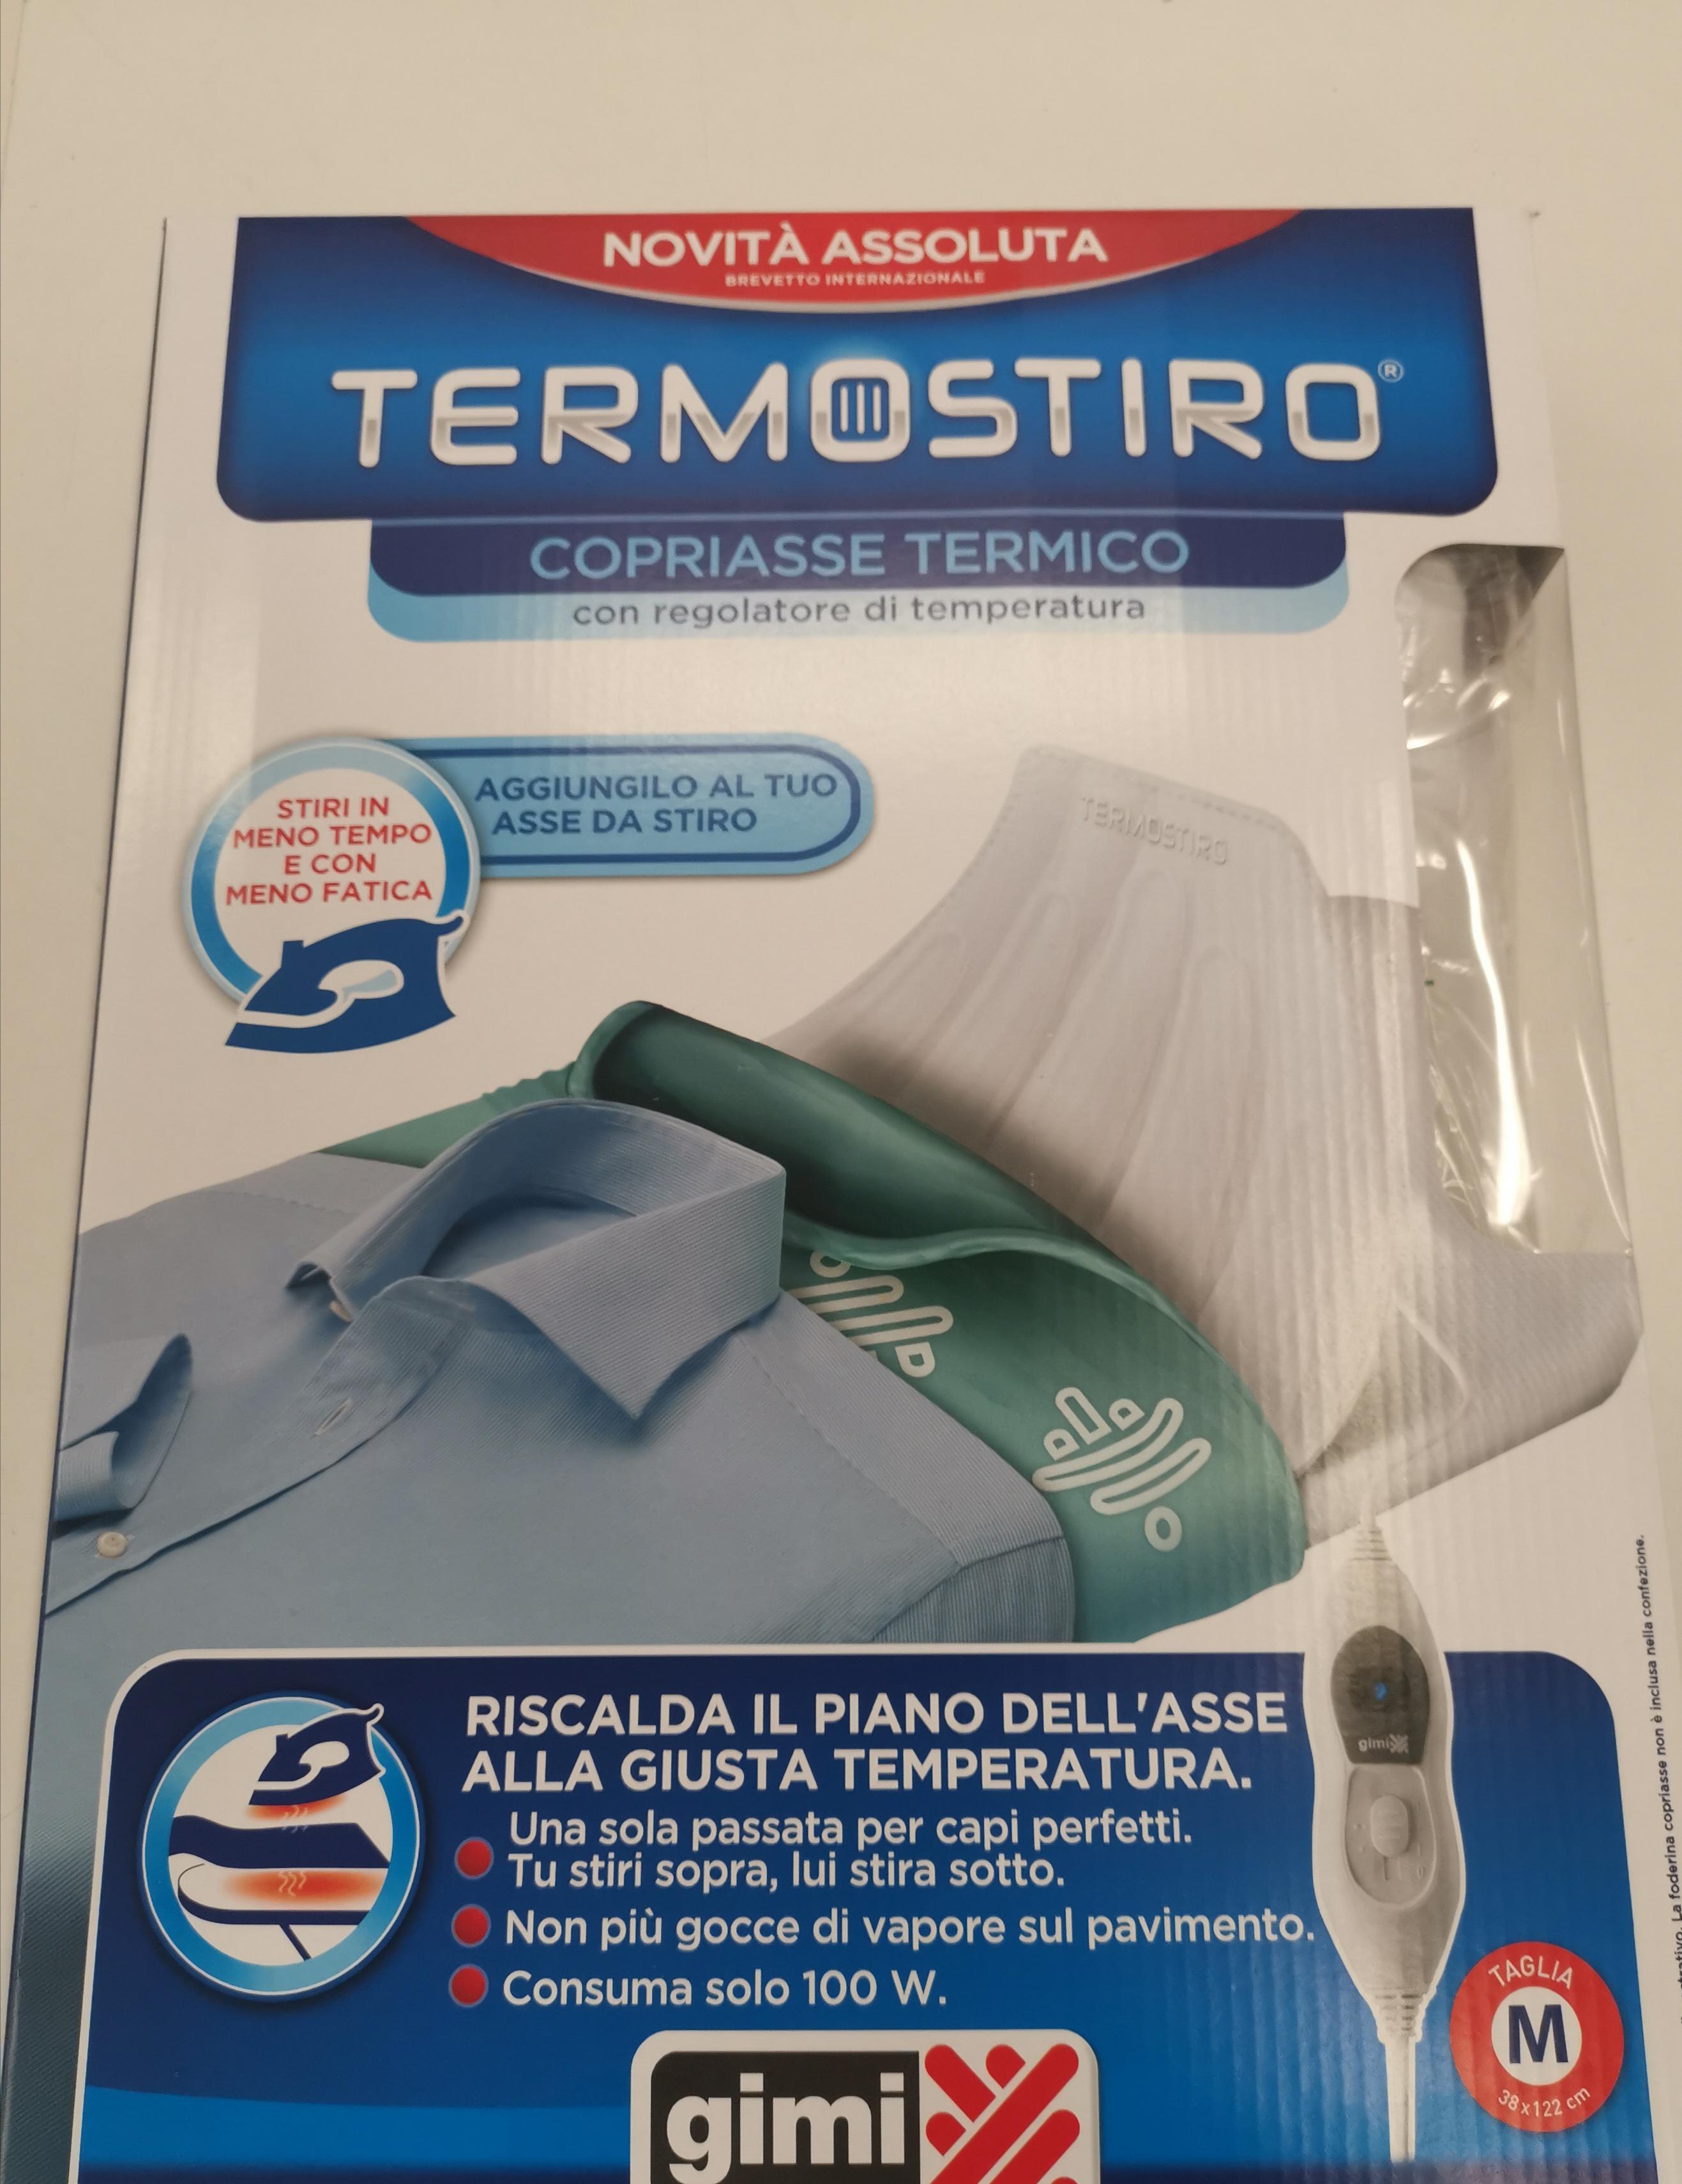 Stock termostiro copriasse da stiro termico Gimi